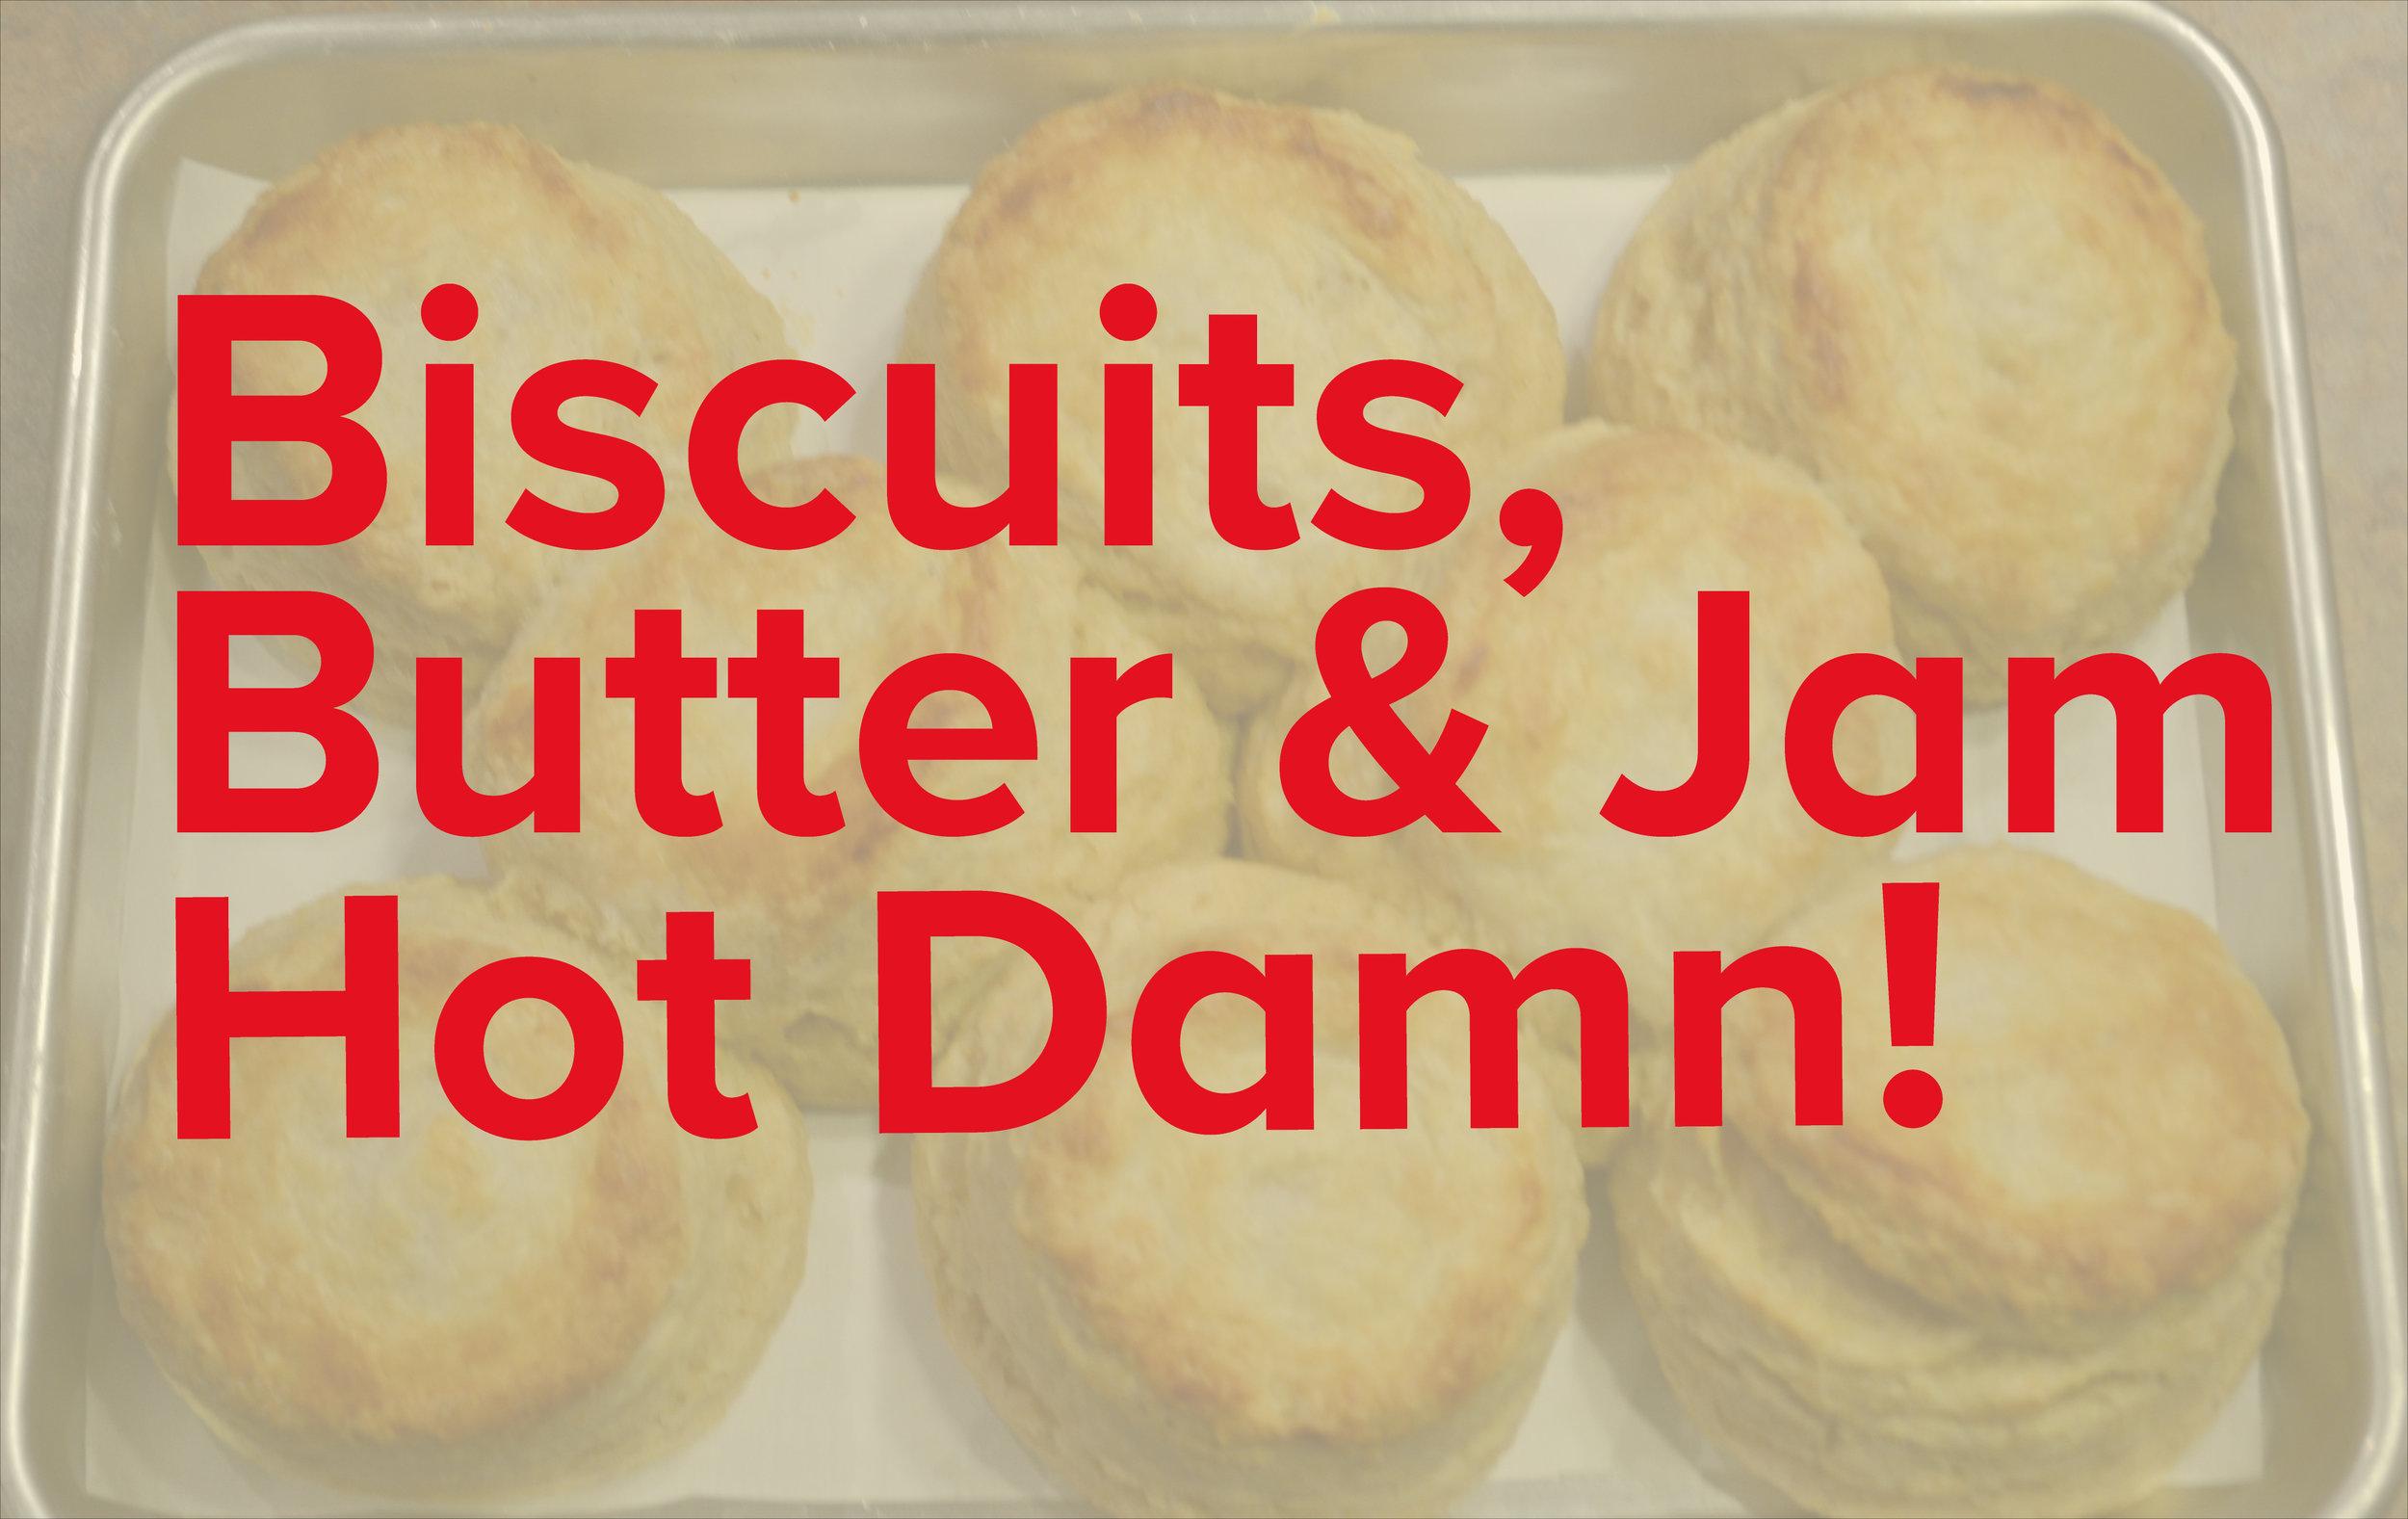 BiscuitBUtter&JamHotDamnBiscuits.jpg